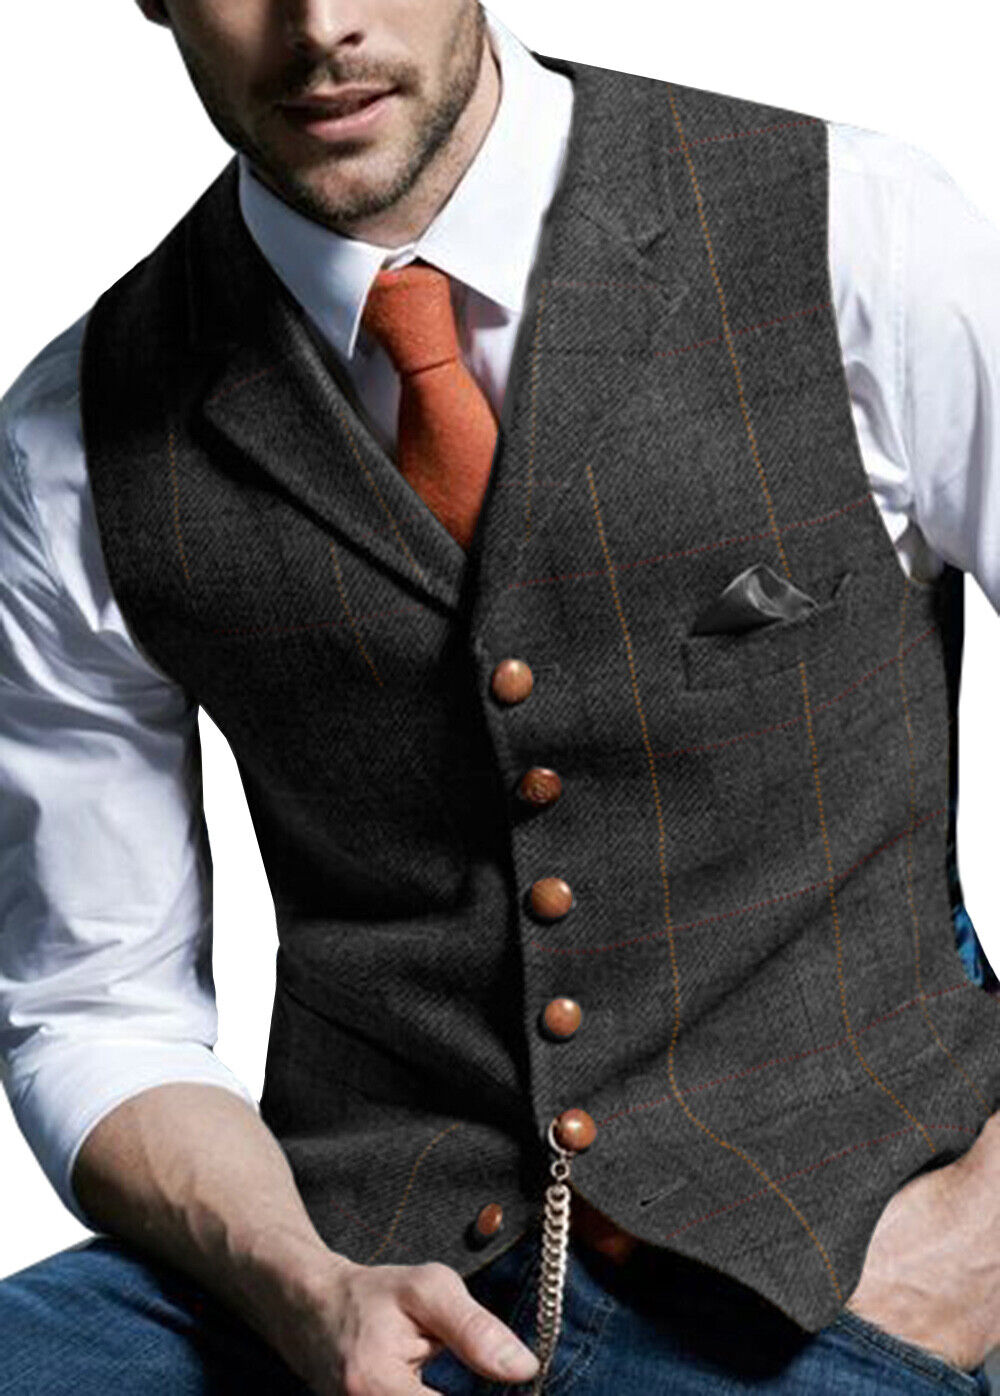 Herren V-Ausschnitt Wolle Herringbone Tweed Casual Westen Anzug 5 Knopf Schwarz+